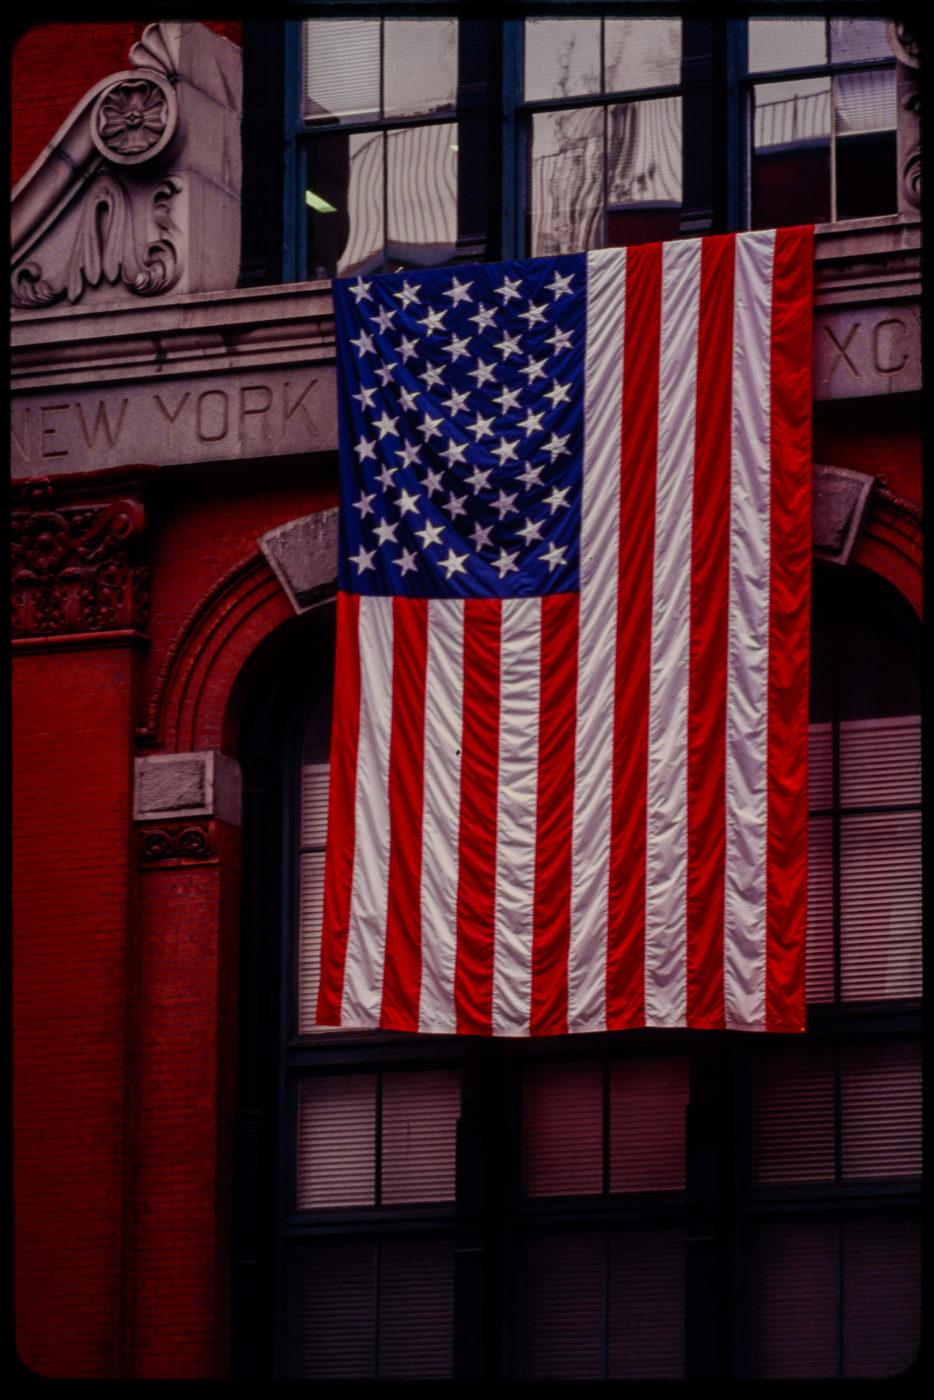 (Now Former) New York Mercantile Exchange at 2-6 Harrison Street Displaying an American Flag.jpg